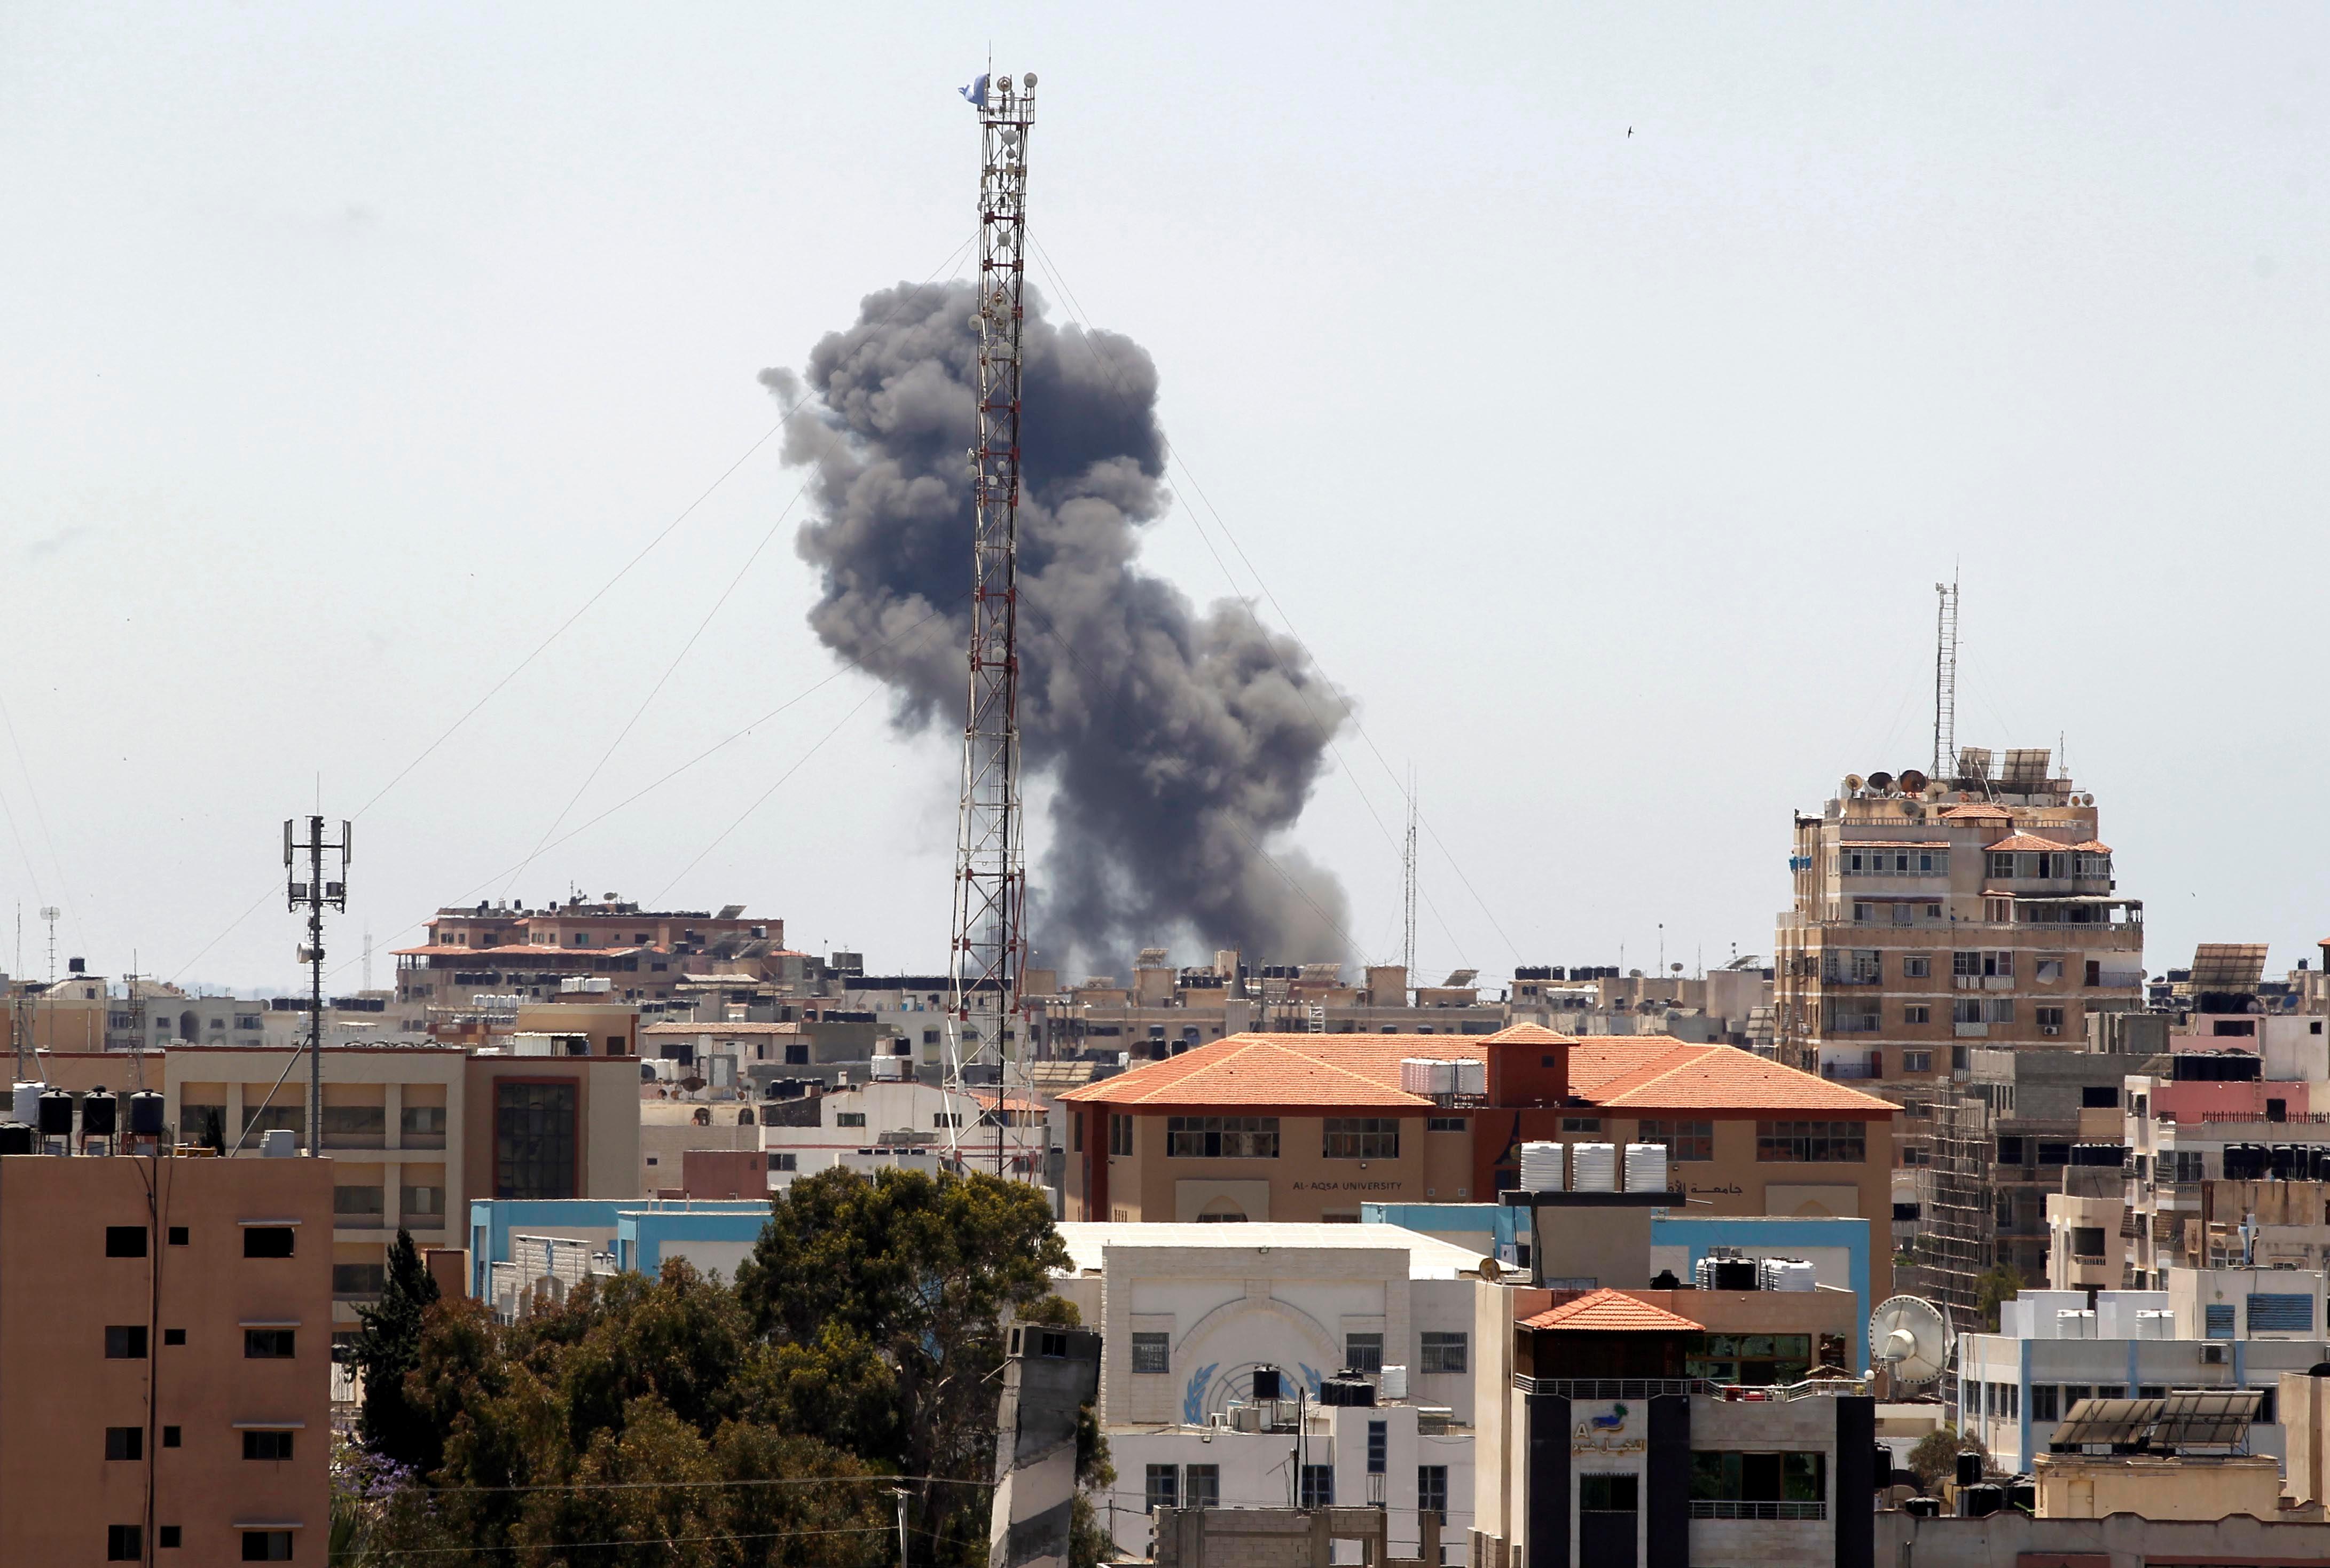 Fumaça em prédio de Gaza após ataque aéreo de Israel